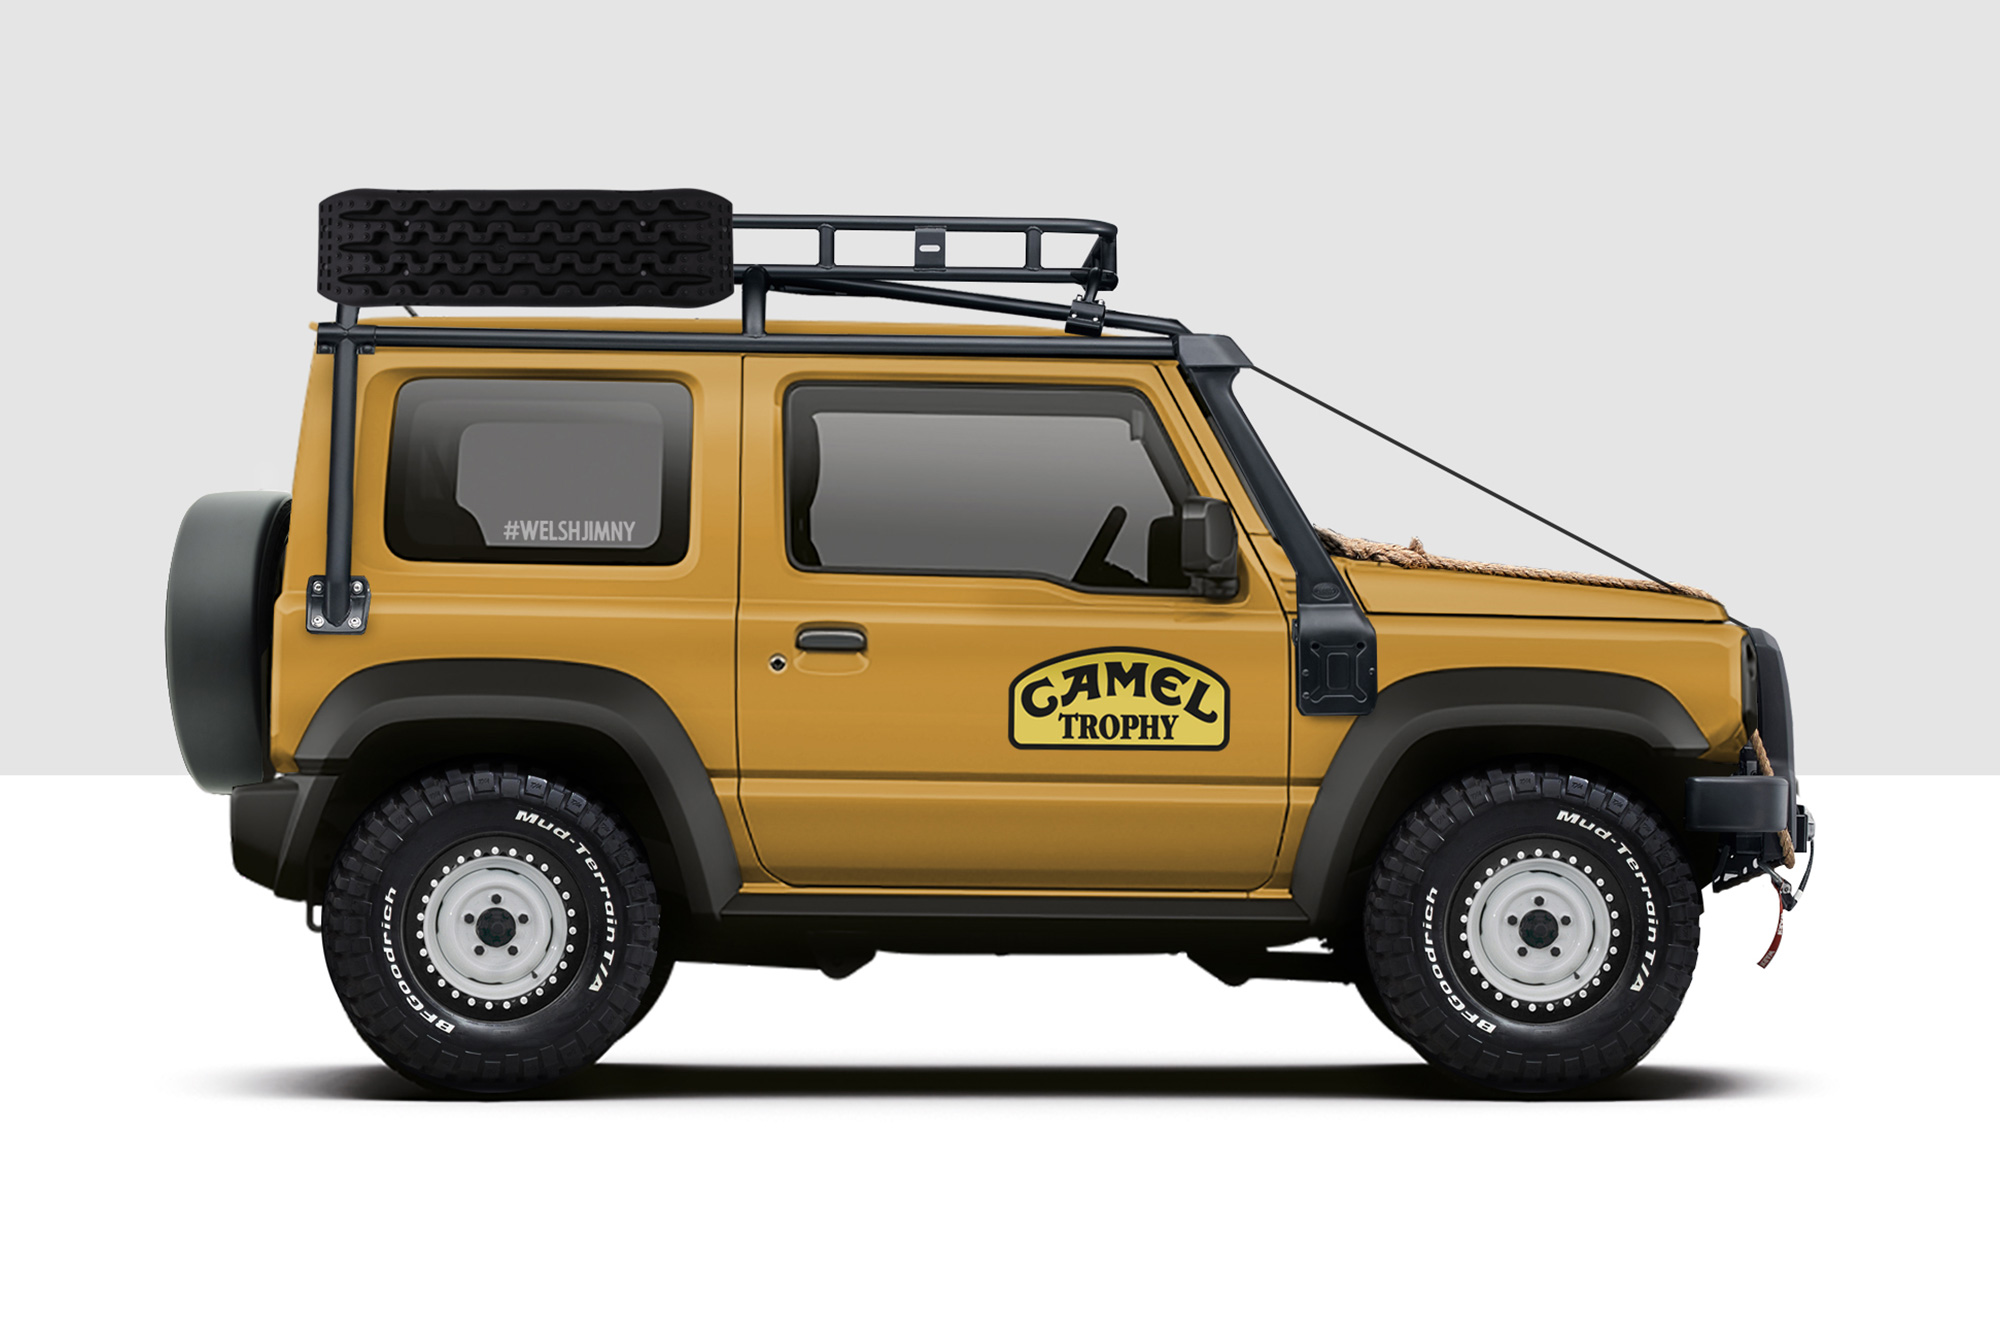 Jimny Camel Trophy Concept